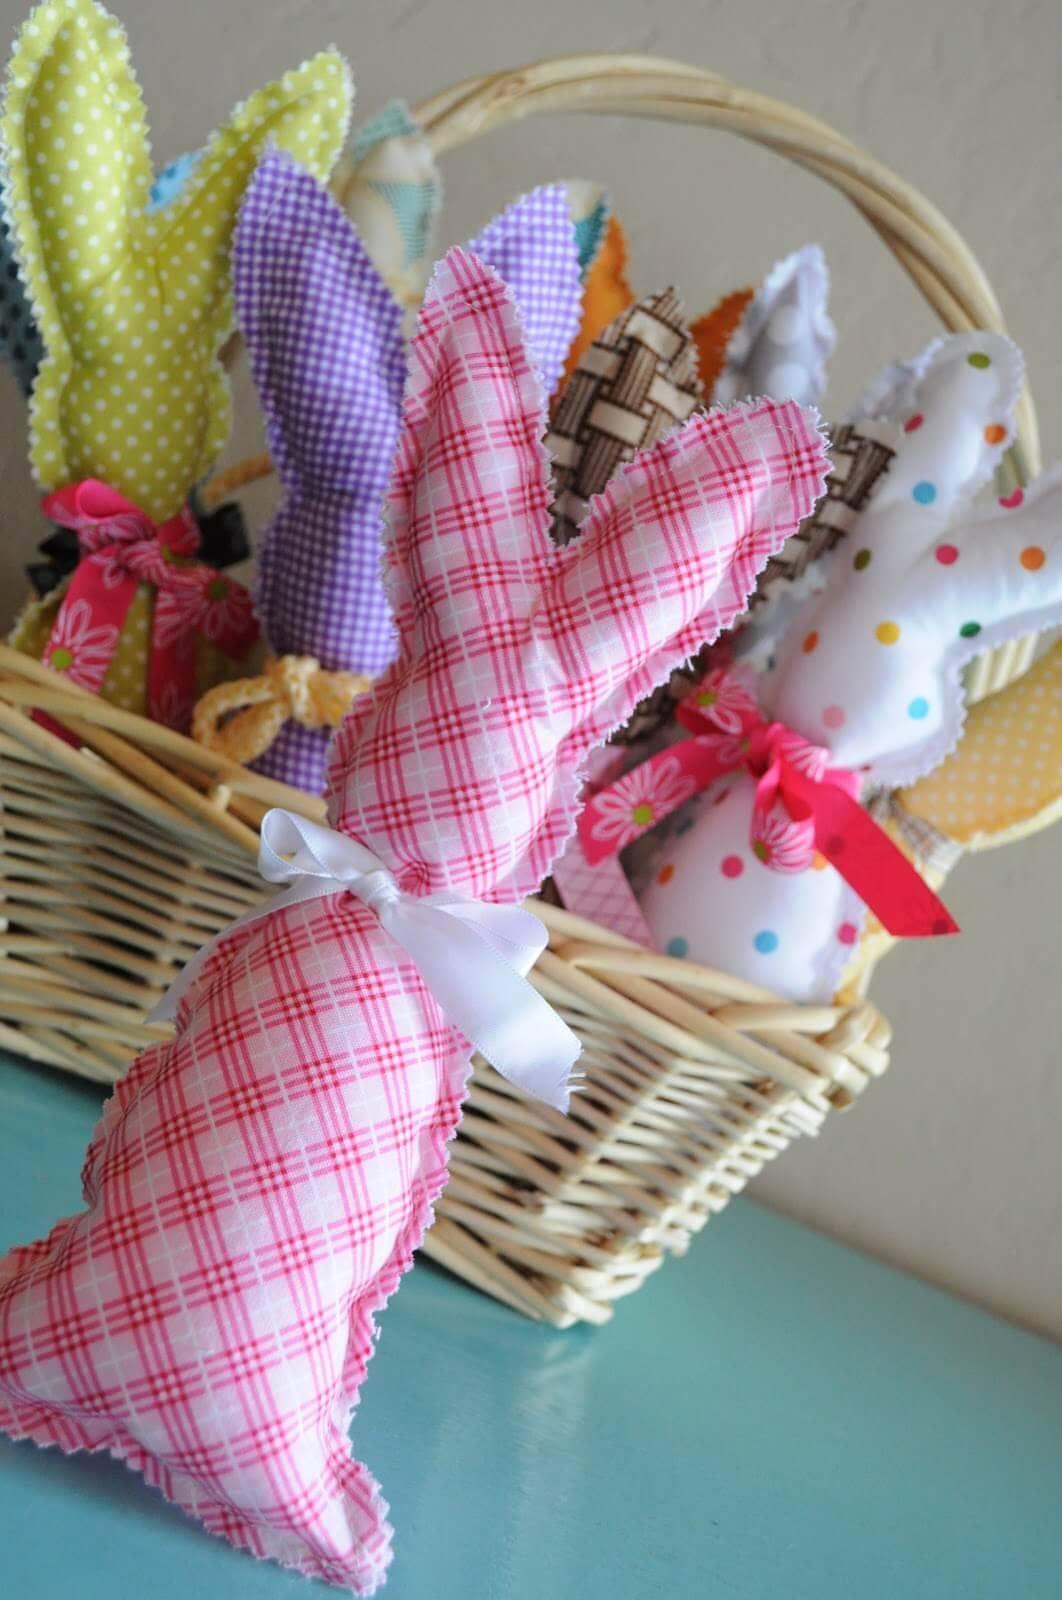 Stuffed Bunnies in a Basket